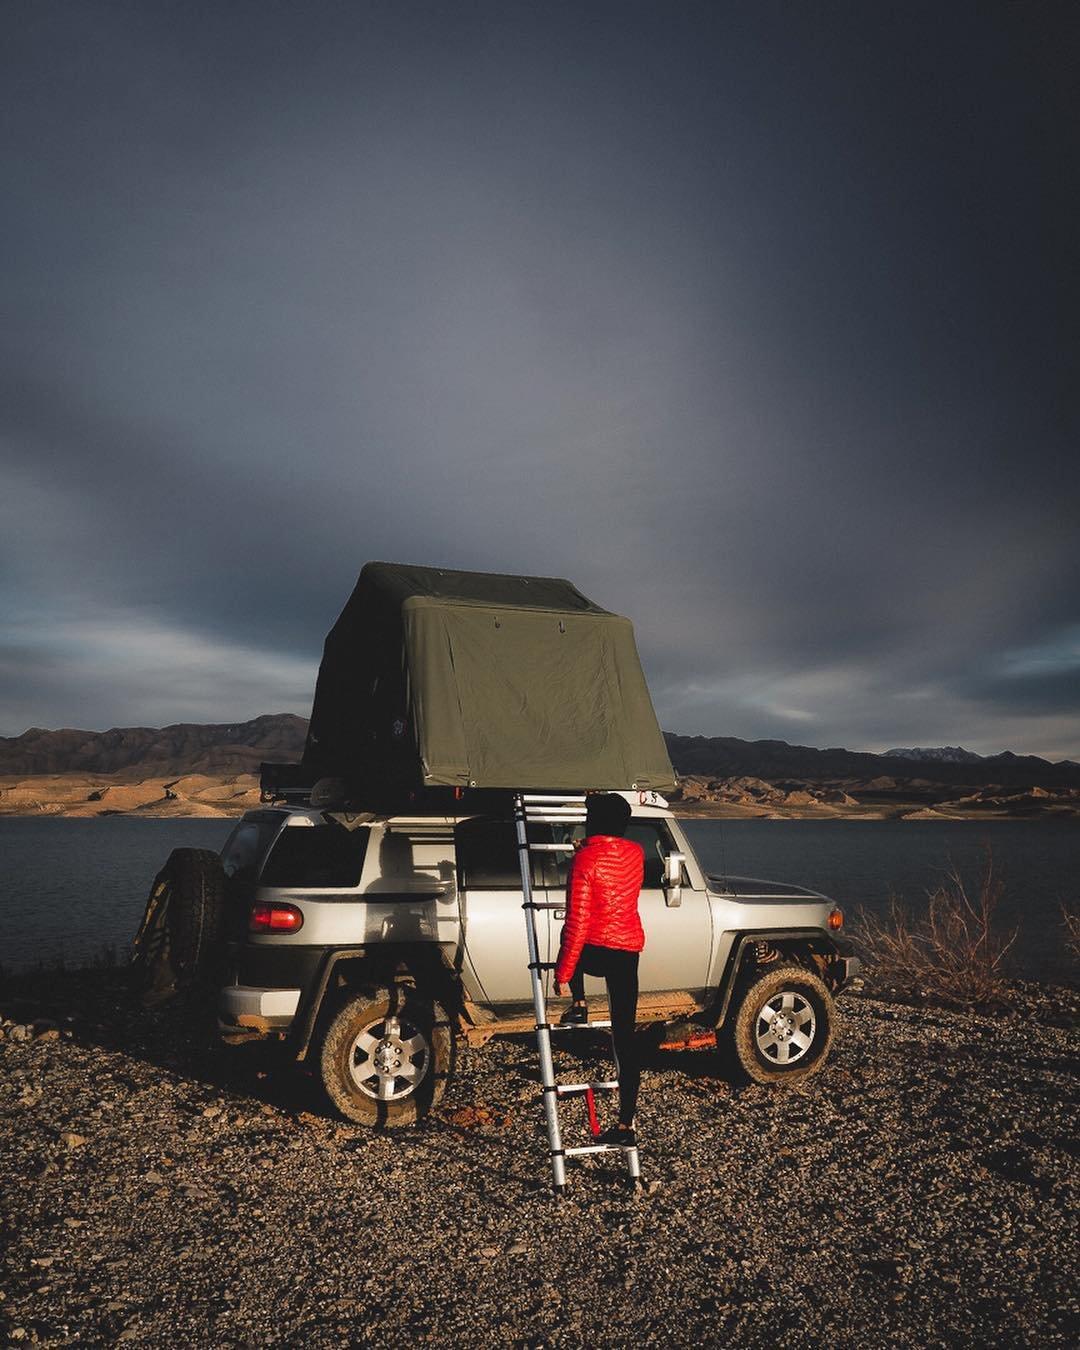 It's been a moody weekend.  I dig moody. • • • PC tchudatwentyfour  #weekendadventures #overlanding #wearetravelgirls #adventureawaits #radgirlslife #sheisnotlost #staywild #wanderer #visitnevada #travelusa #rooftoptentsofficial #optoutside #cntraveler #traveltribe #lakelife #exploretocreate #mountainlove #neverstopexploring #outdoorswoman #adventureiscalling #nevada #tepuitents #toyotafjcruiser #outbound #findyourpark #staywild #lifeelevated